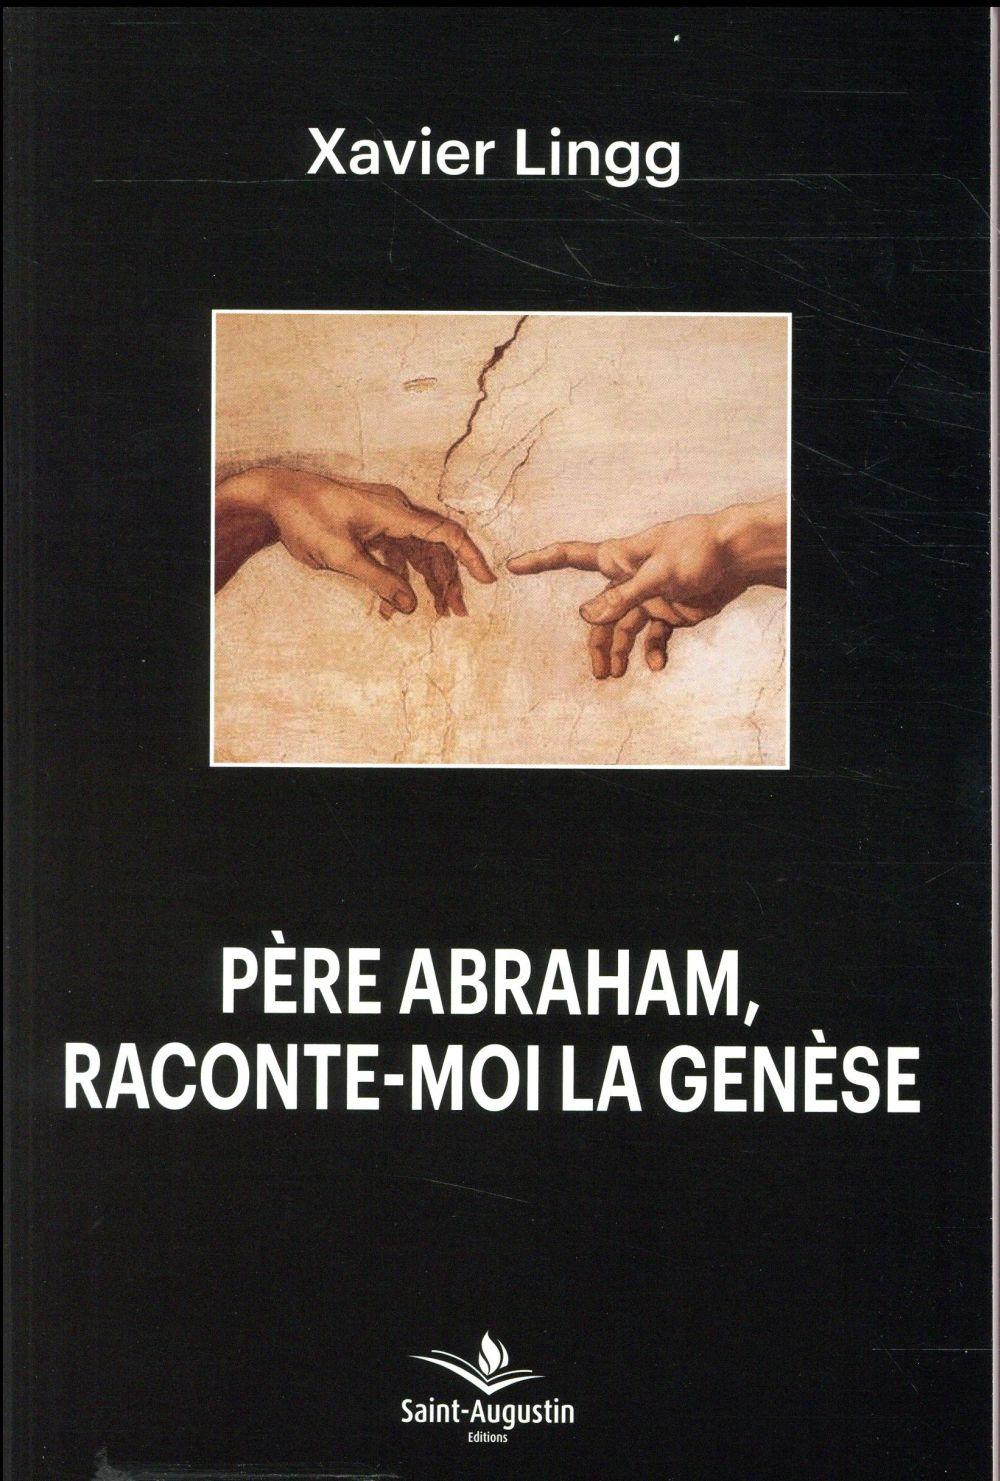 PERE ARAHAM RACONTE-MOI LA GENESE